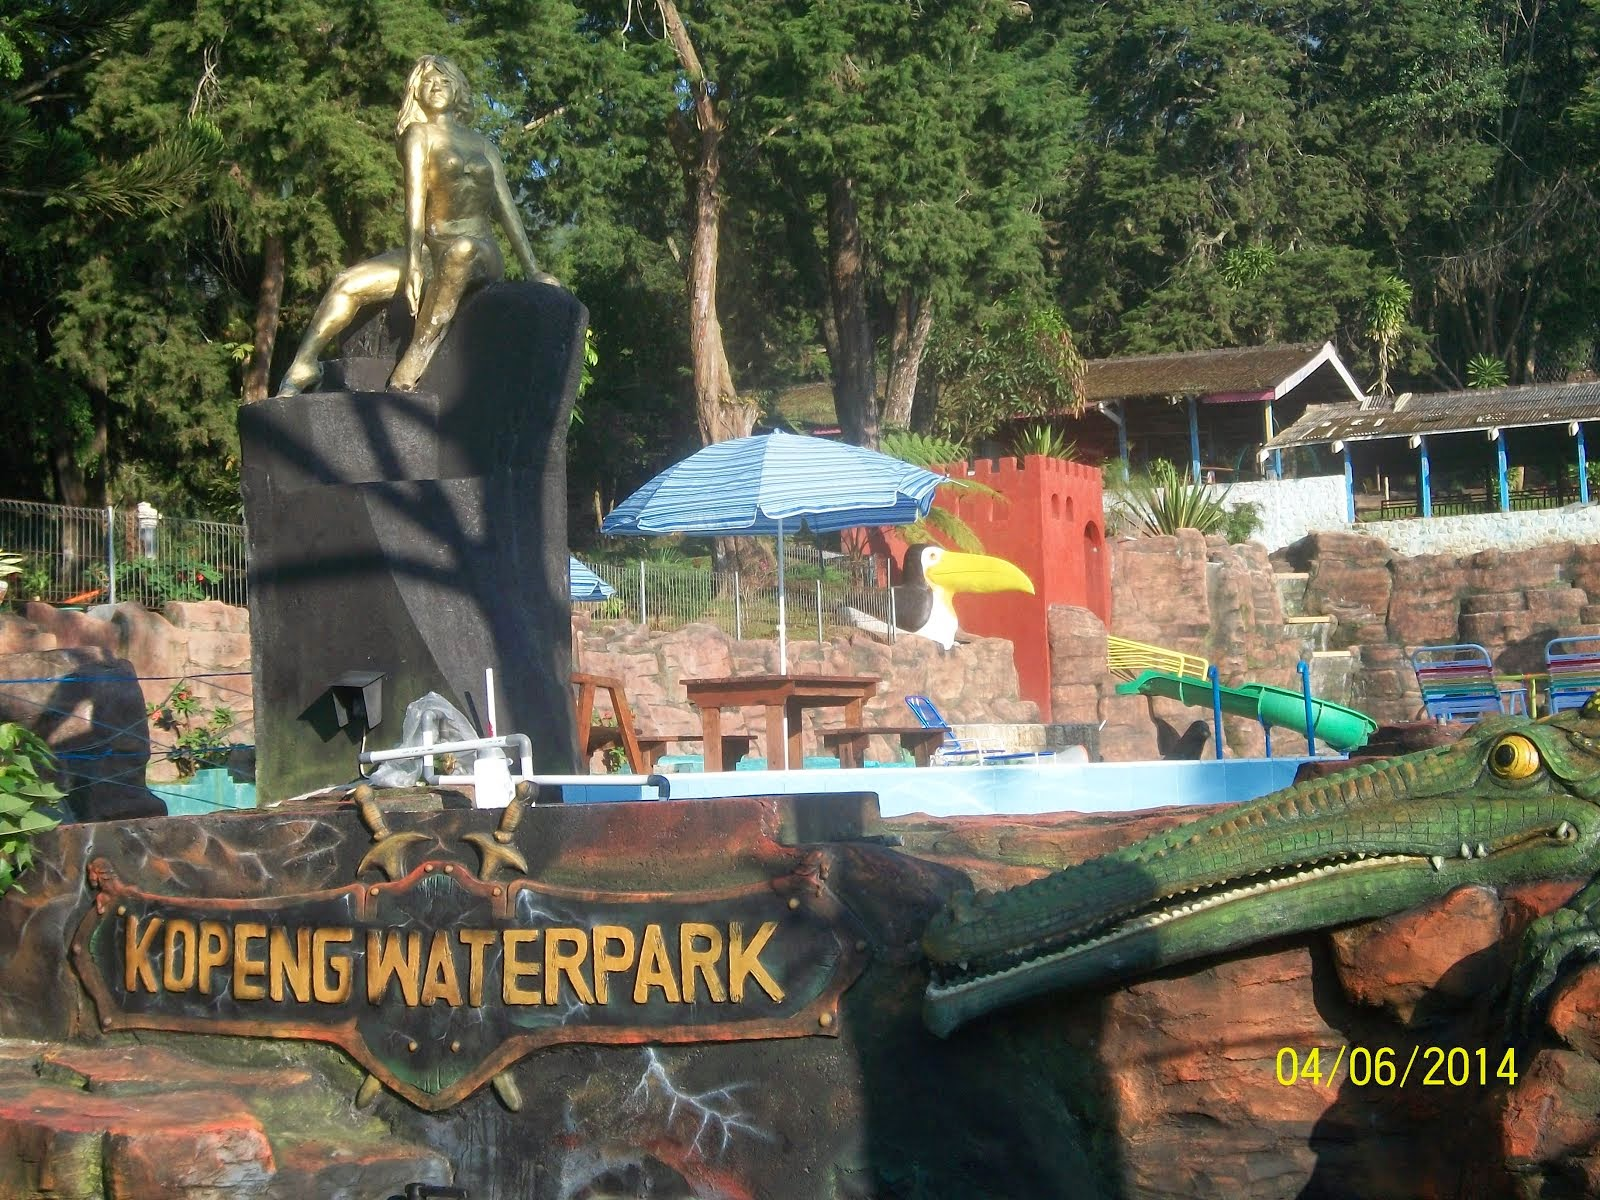 Selamat Datang Kopeng Waterpark & Salam Kenal Kopeng Outbound